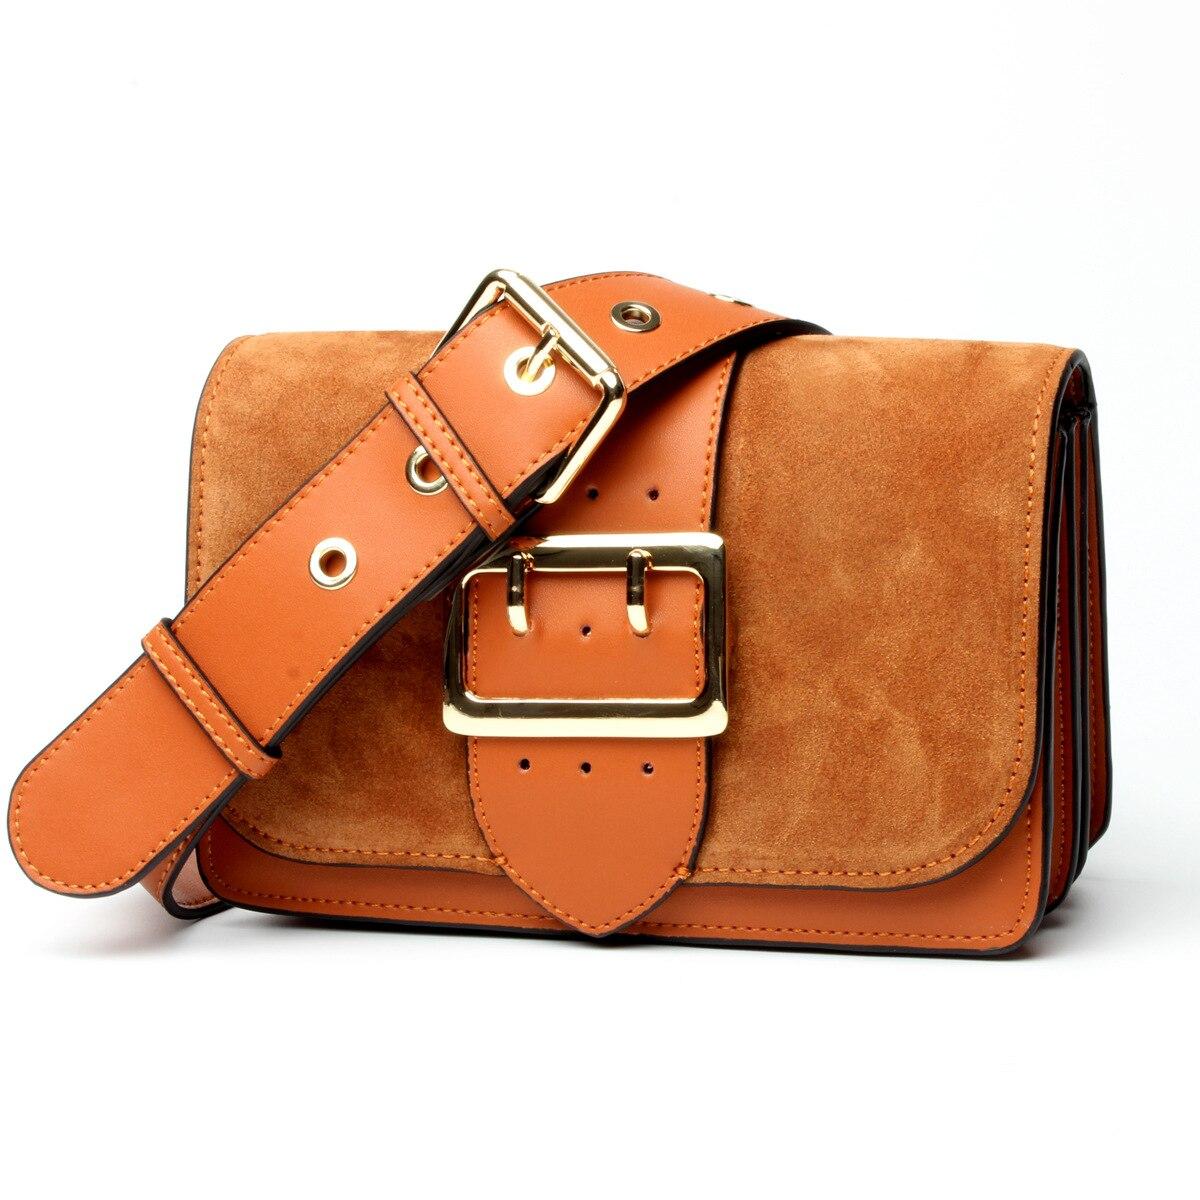 ФОТО Women Messenger Bags Flap Bag Lady Crossbody Shoulder Bags Small Female Handbags L6132